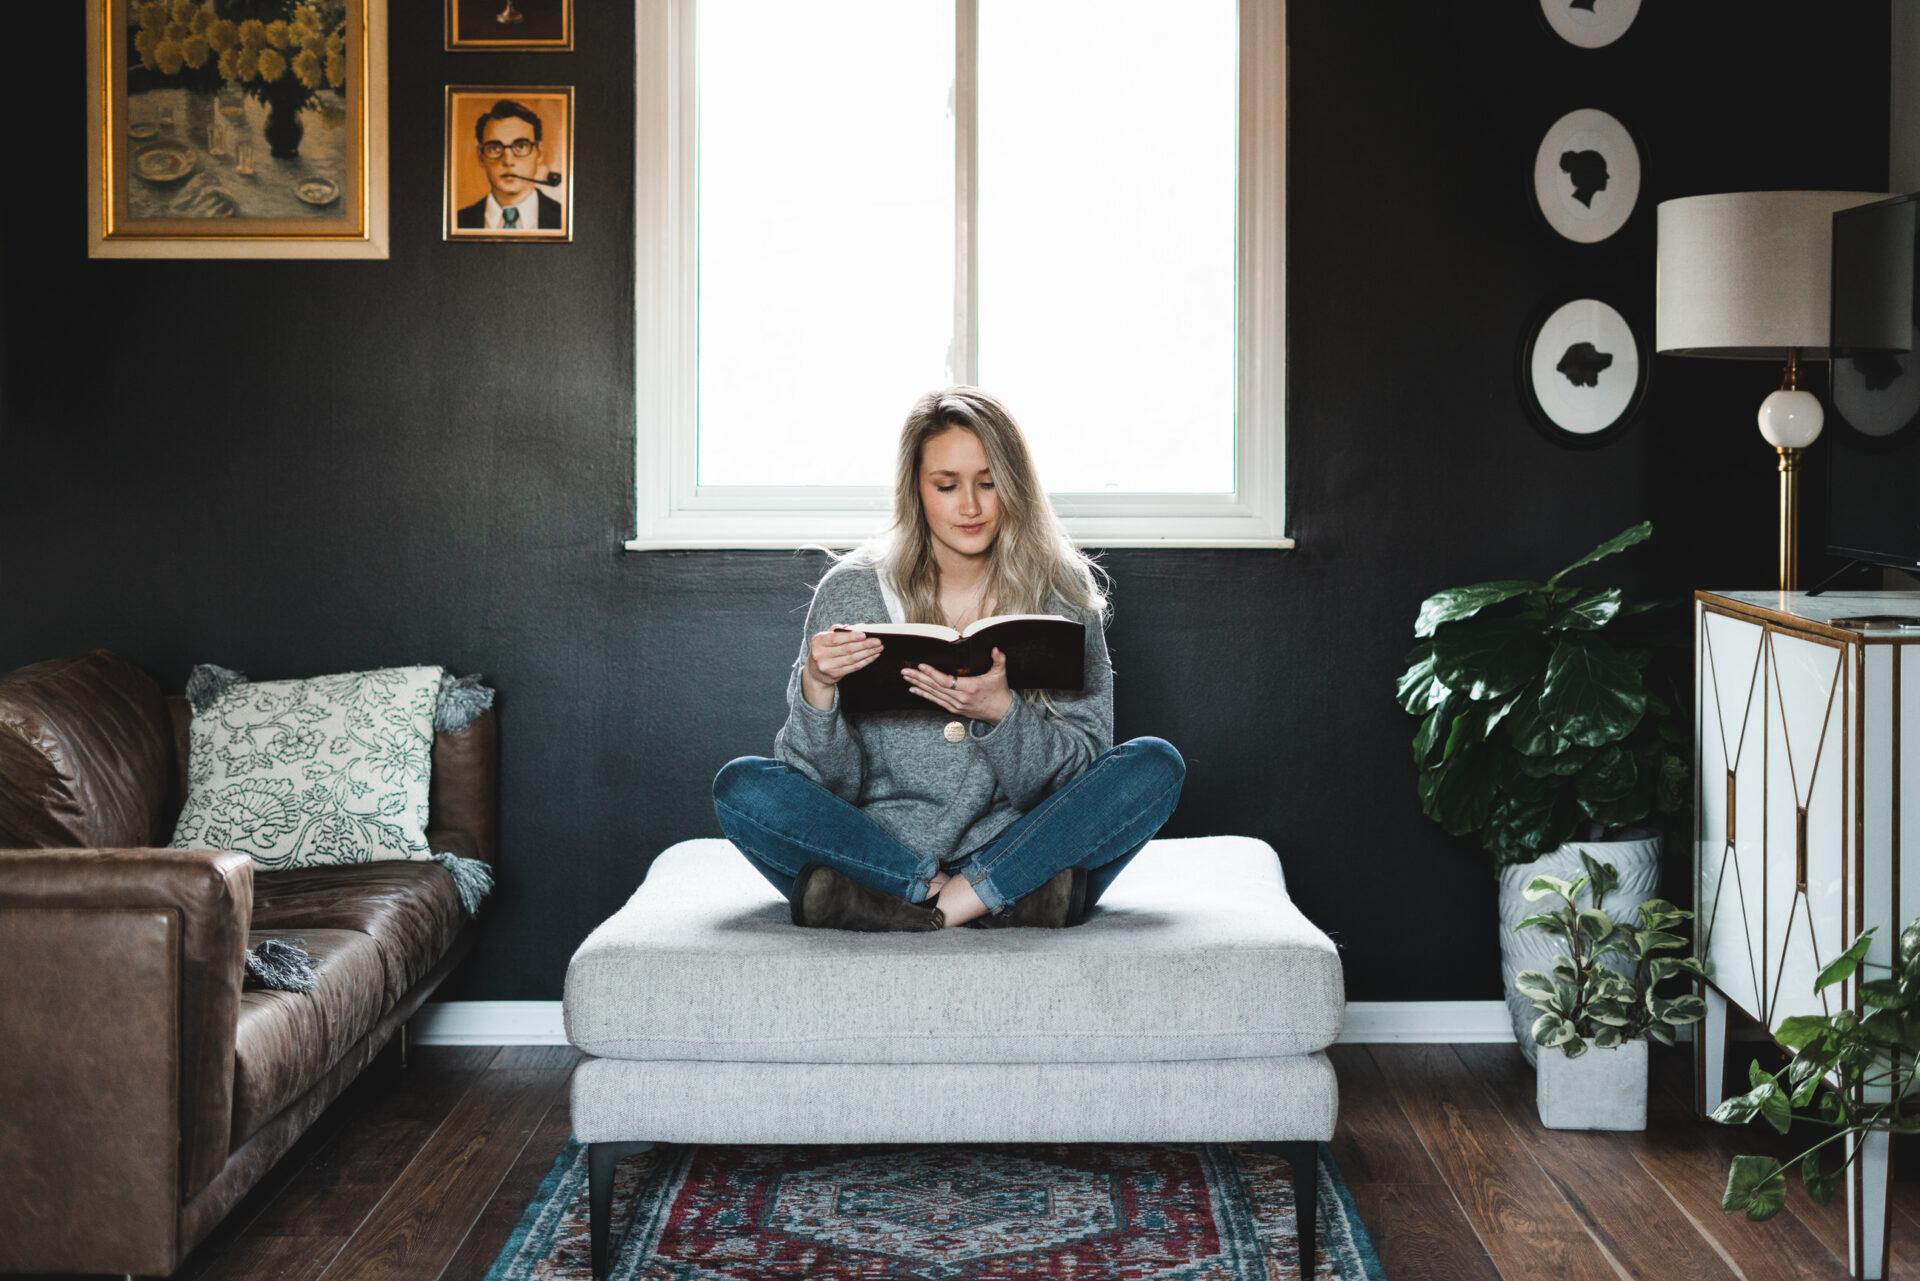 Girl reading Bible on large ottoman